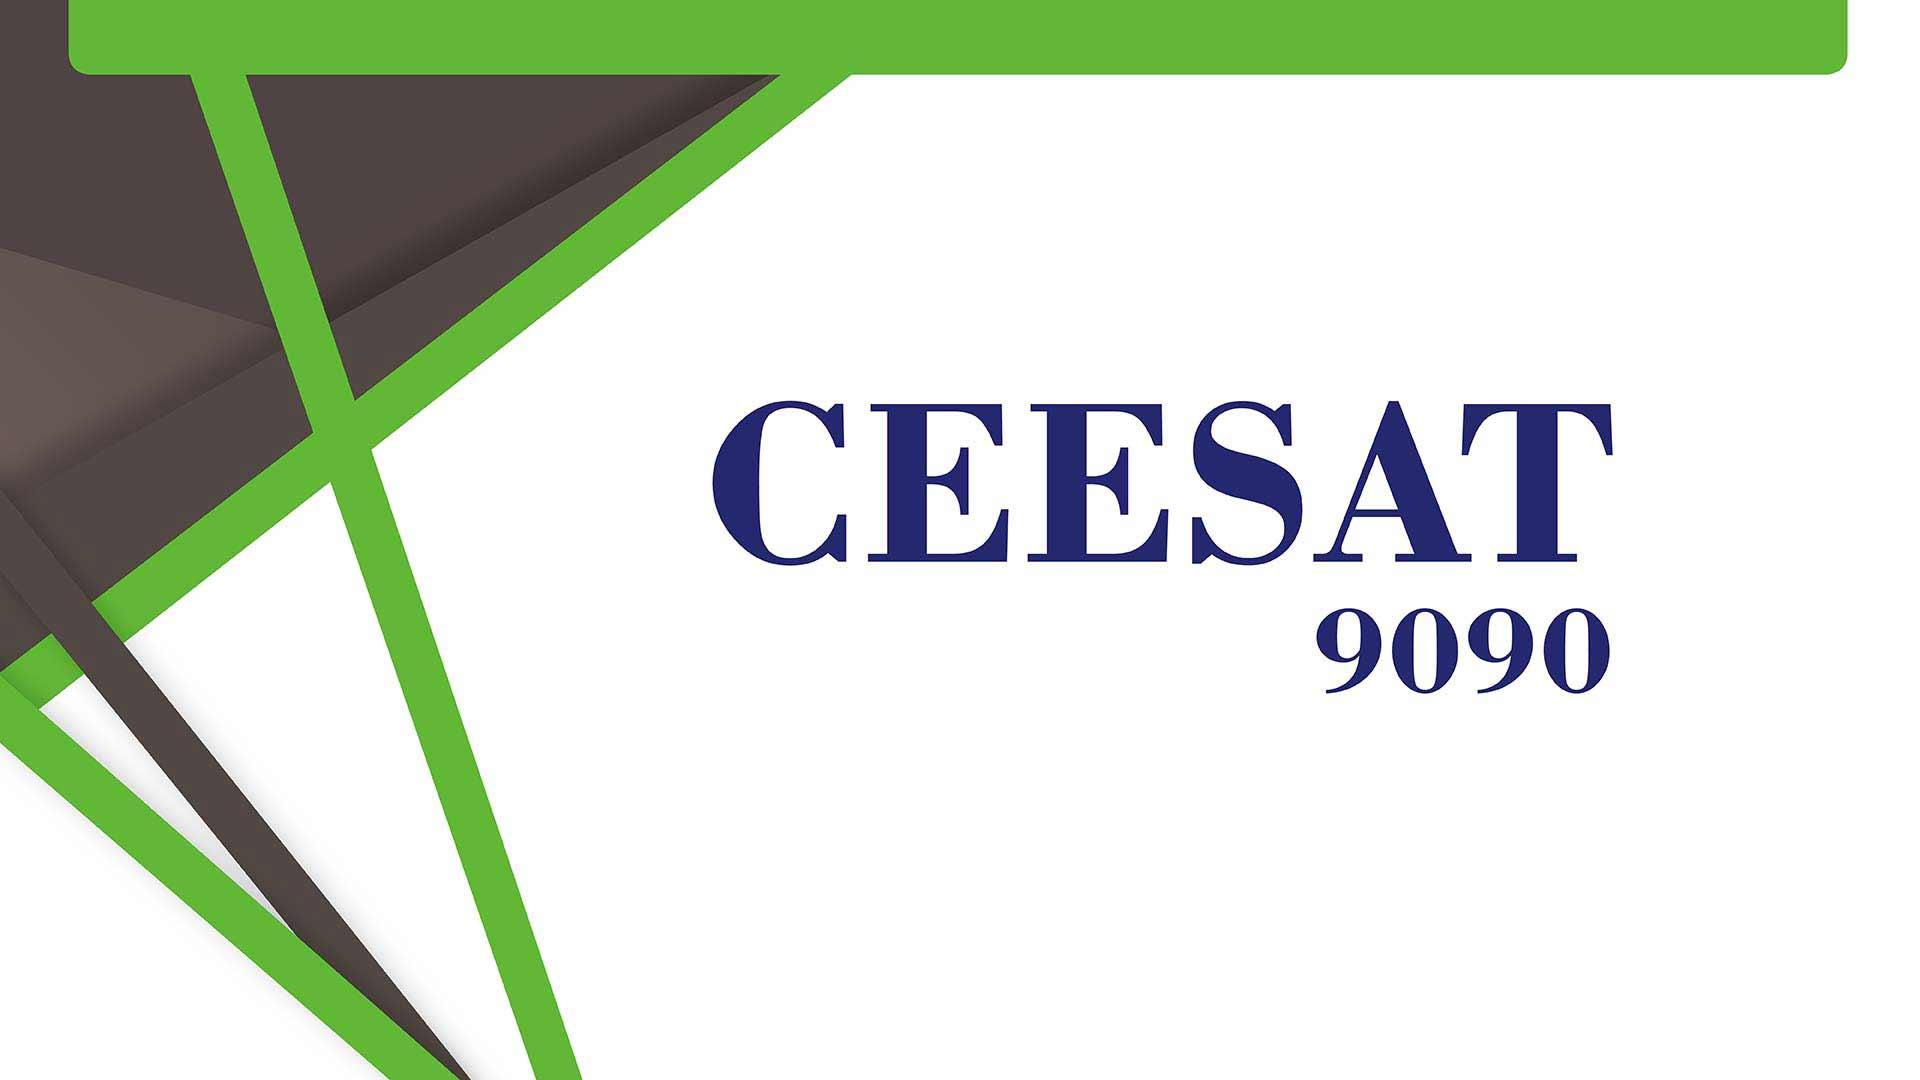 Download Software Ceesat 9090 HD New Update Firmware Receiver